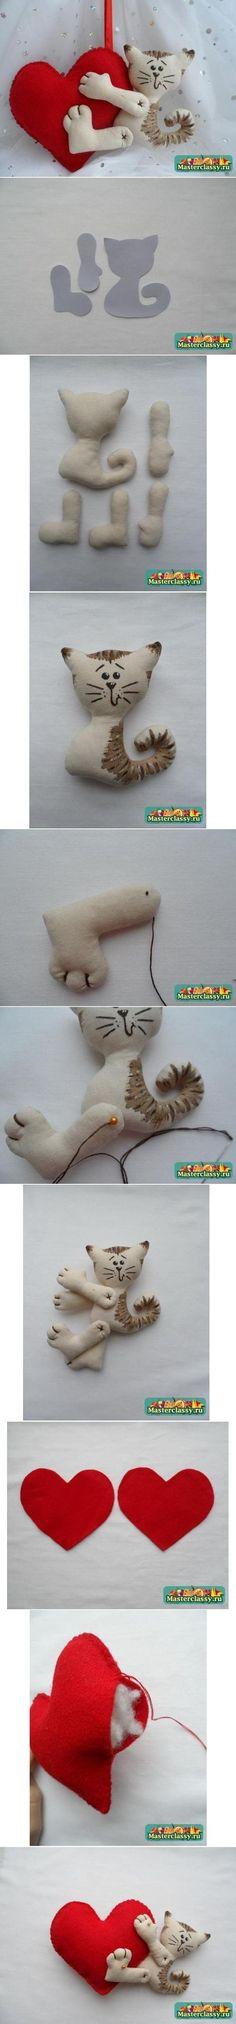 DIY Fabric Heart Kitten DIY Projects / UsefulDIY.com